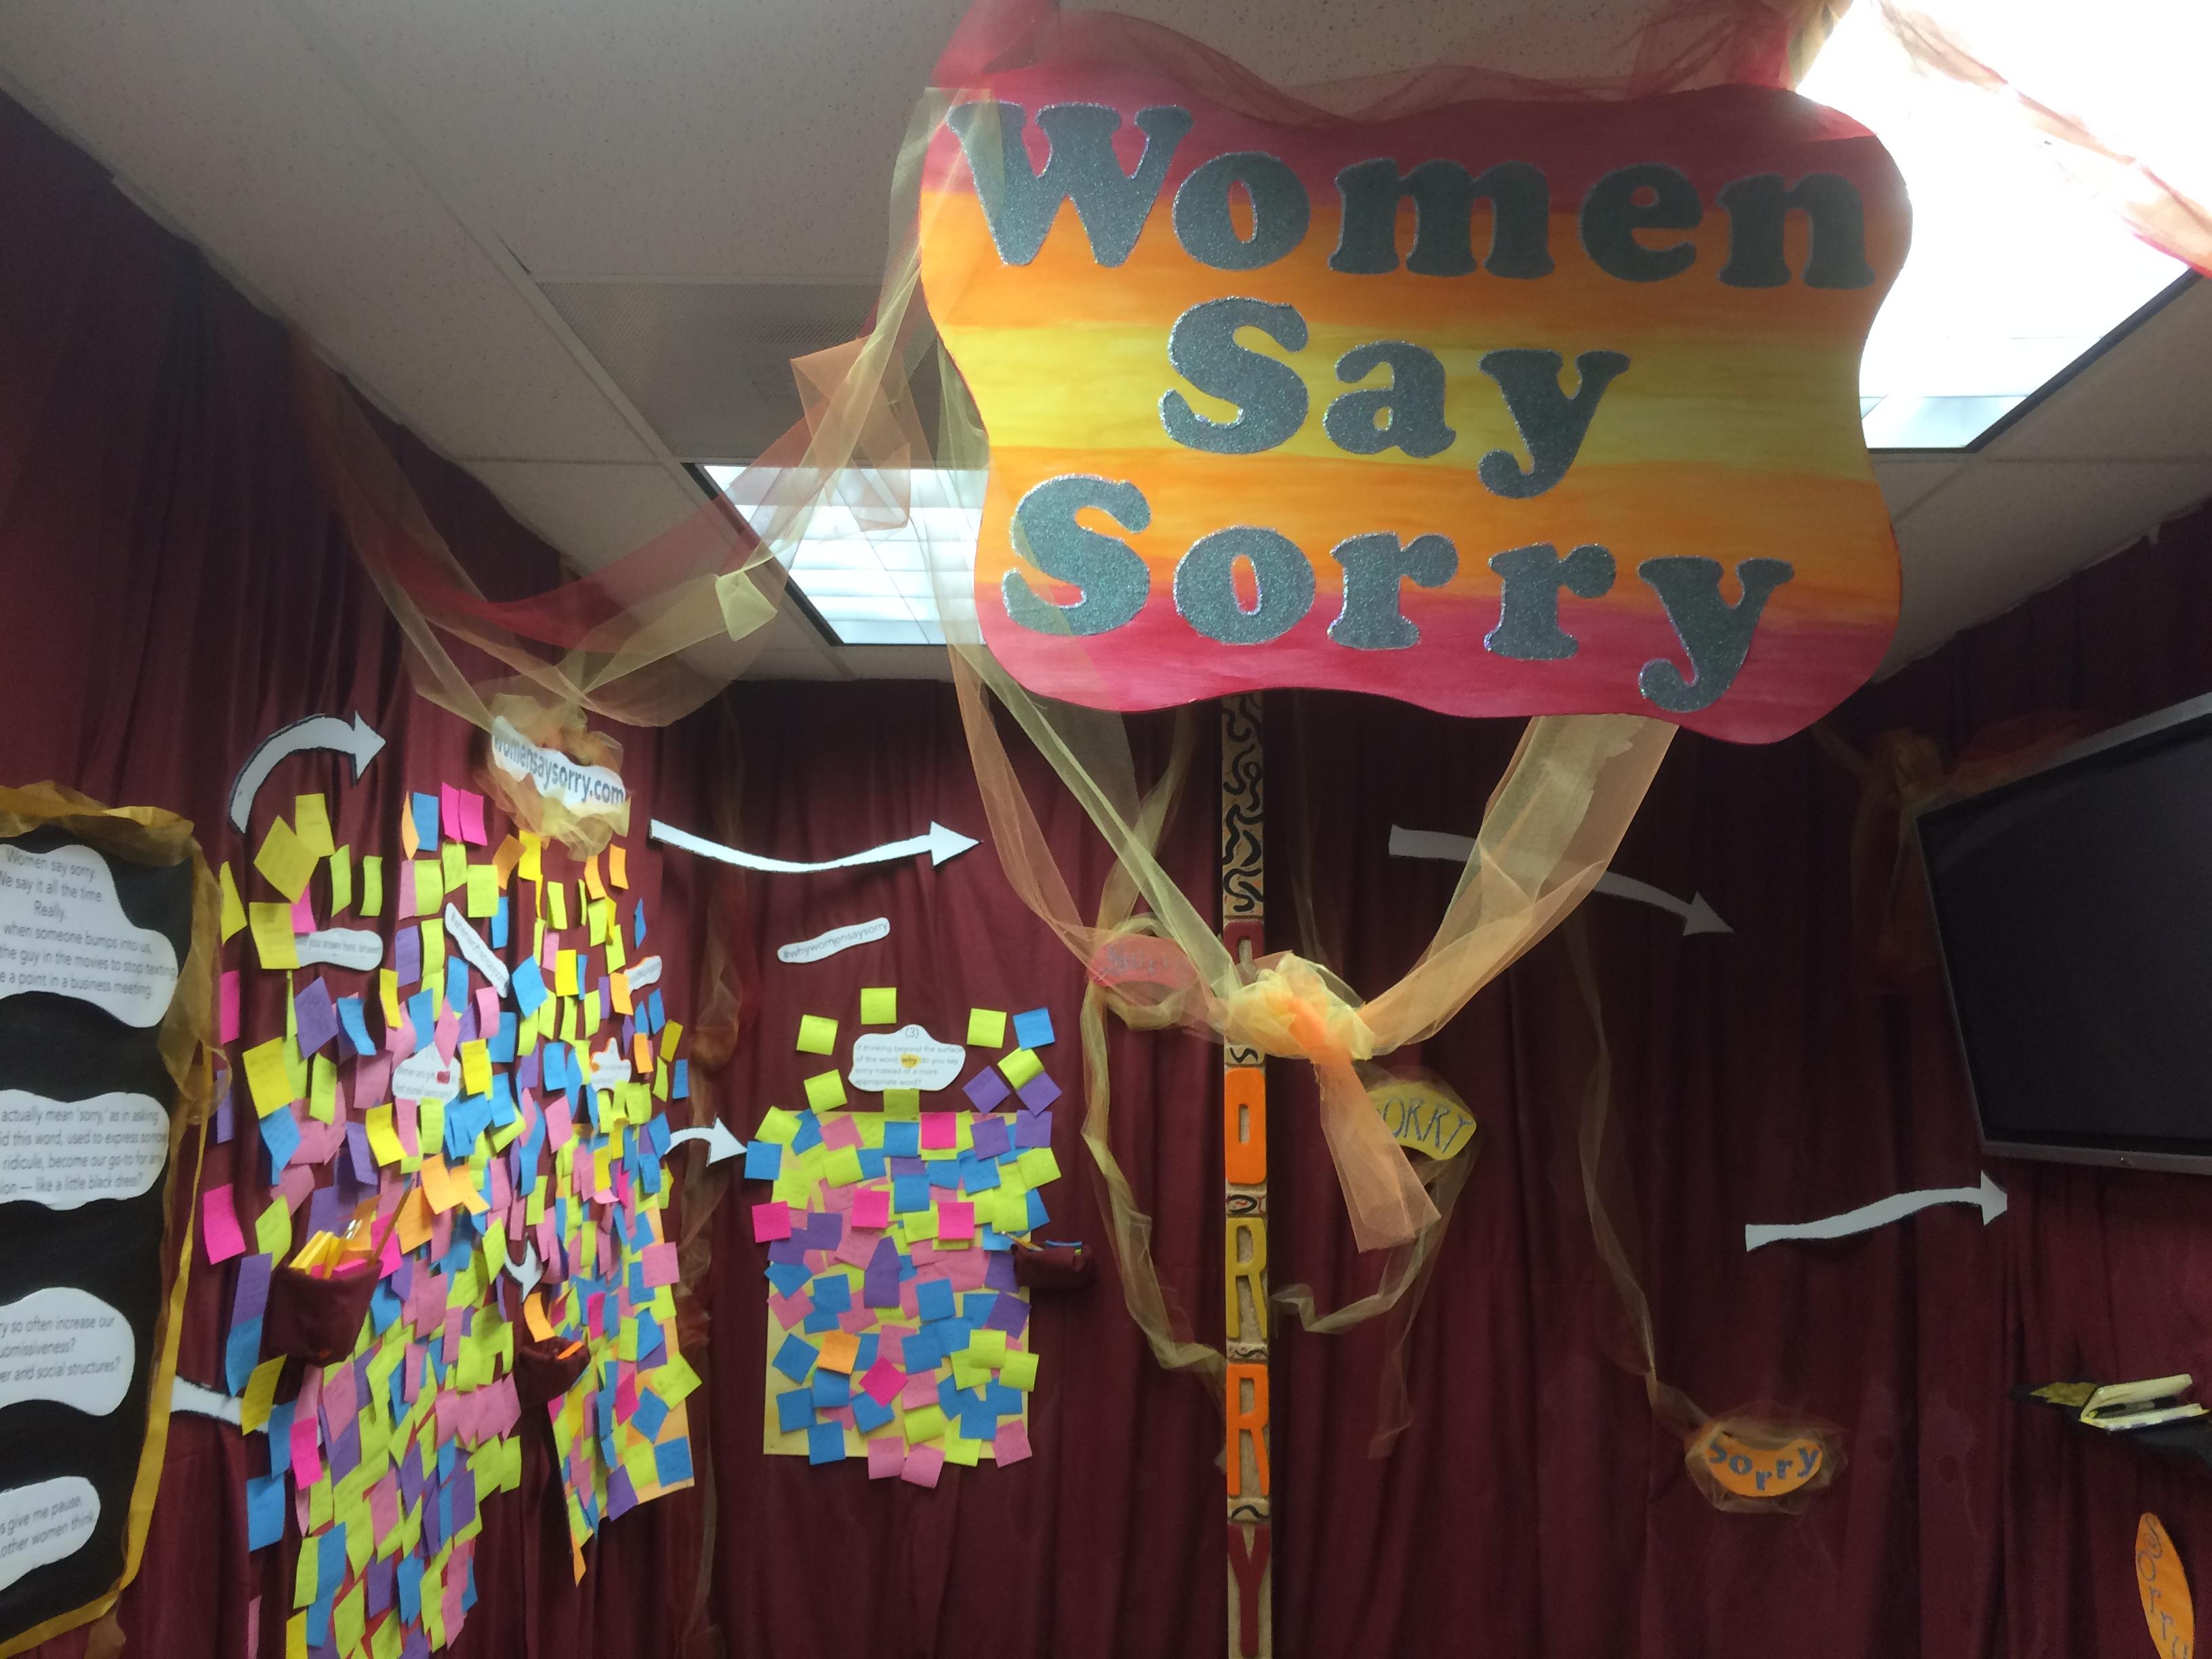 Artomatic: Women Say Sorry